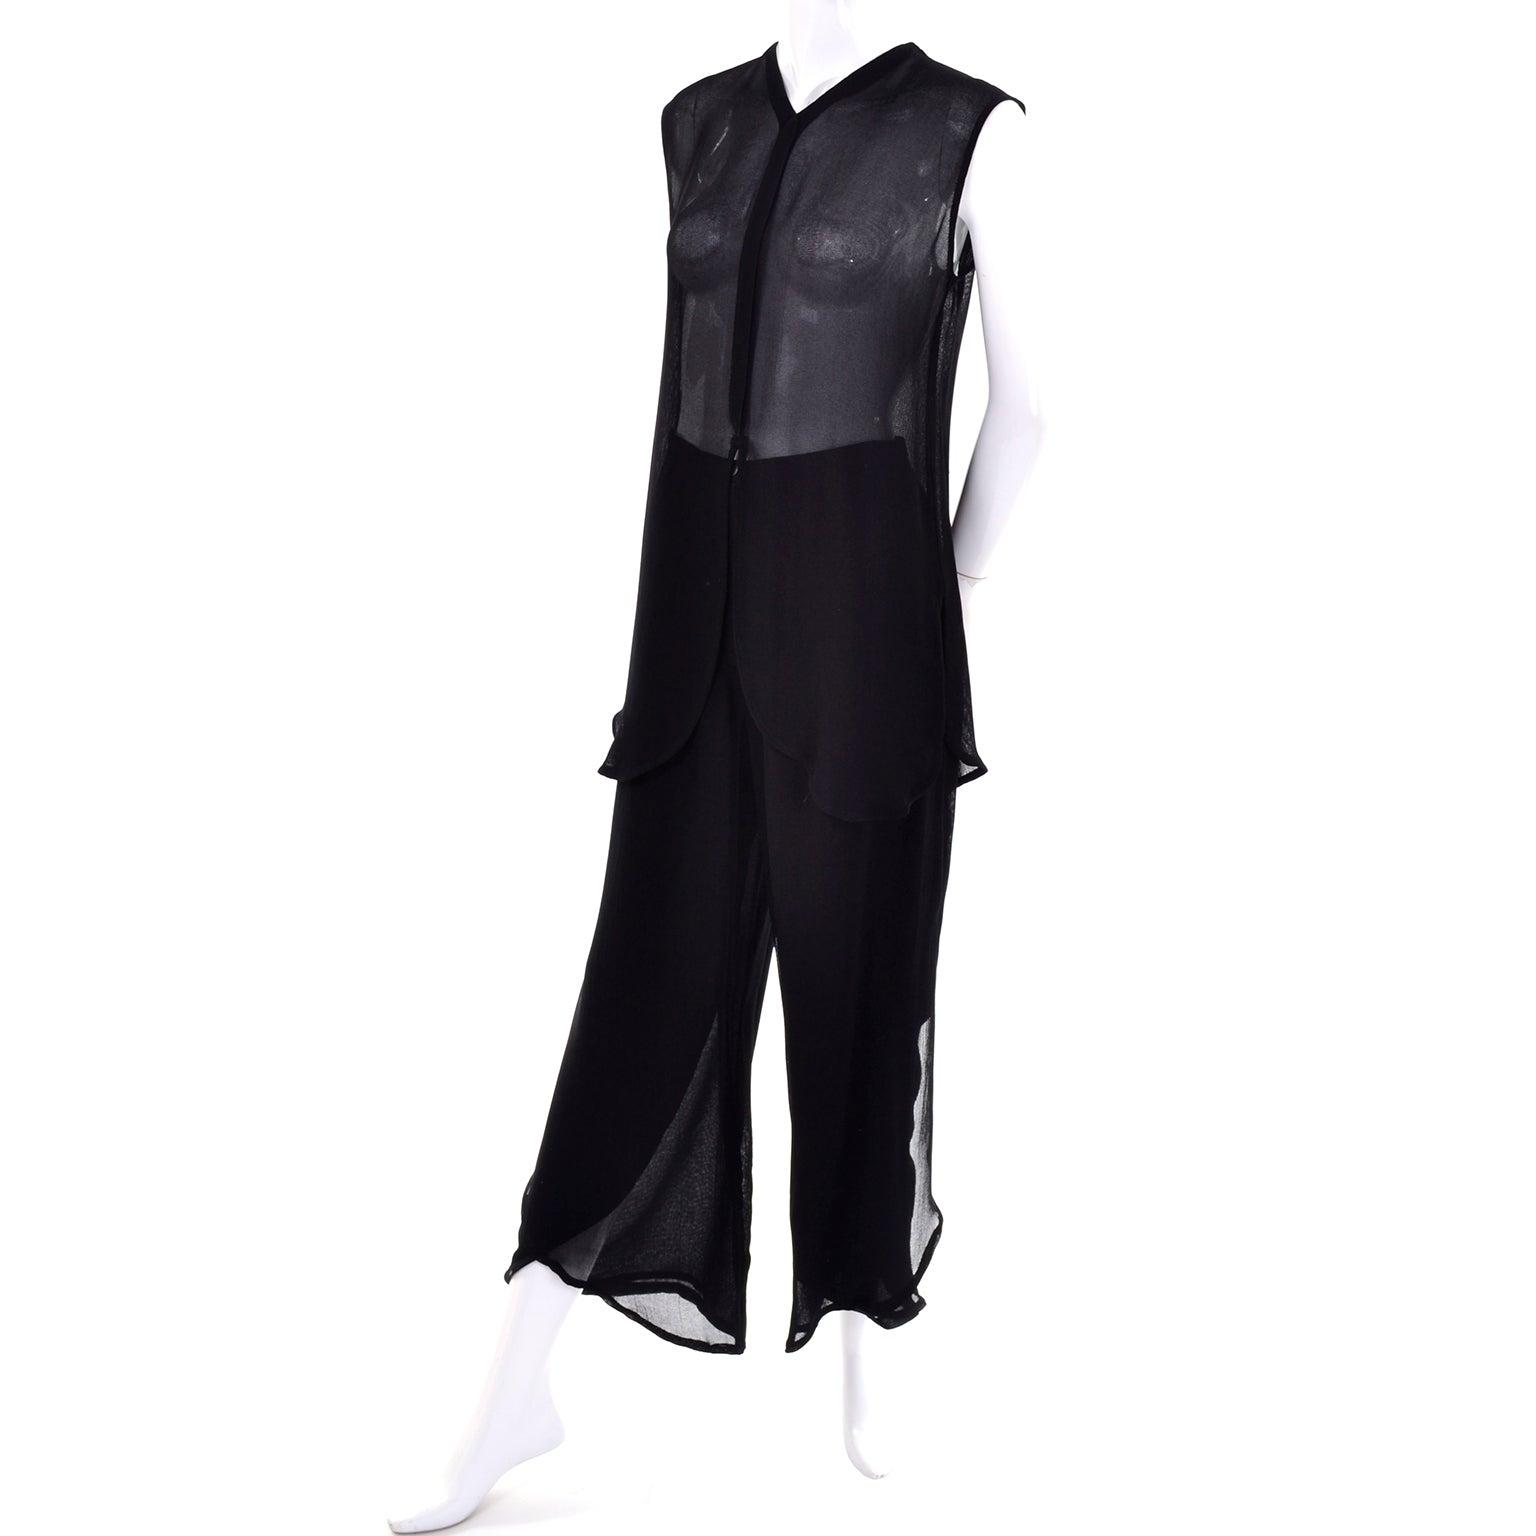 22d7cac4dc8 Vintage Giorgio Armani Black Sheer Crepe Split Pants and Tunic Evening  Ensemble For Sale at 1stdibs